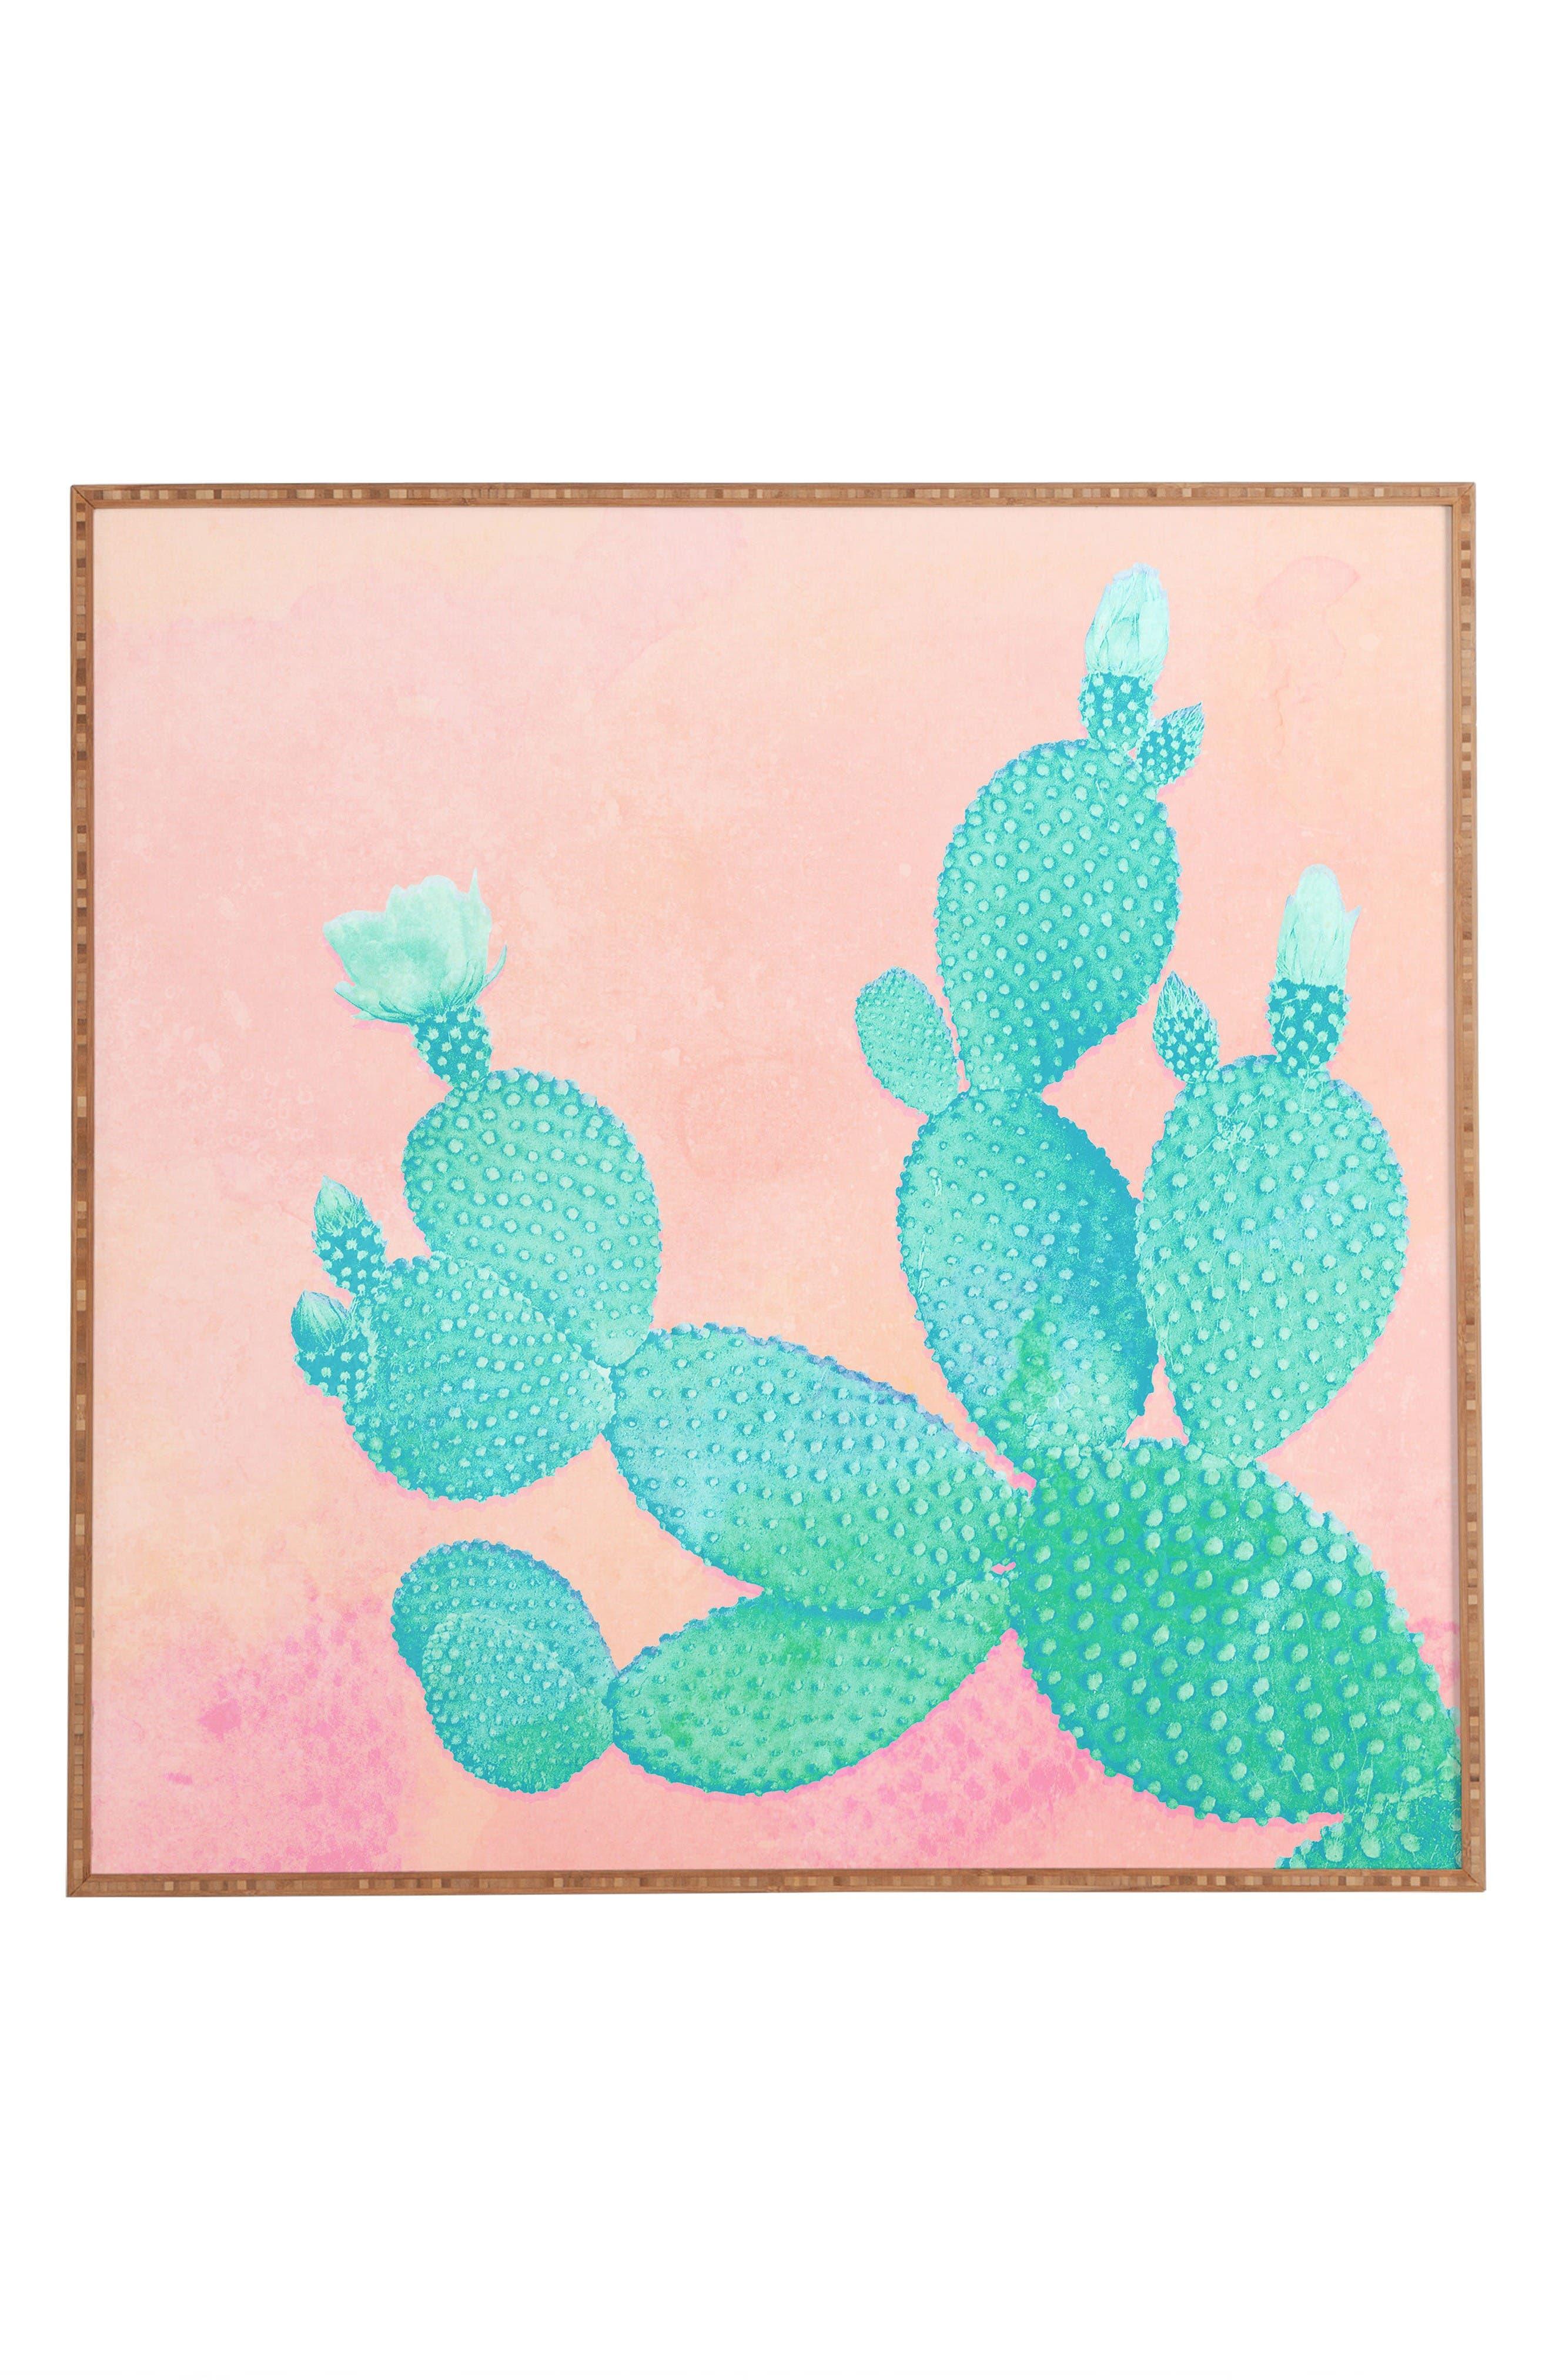 Alternate Image 1 Selected - Deny Designs Pastel Cactus Framed Wall Art